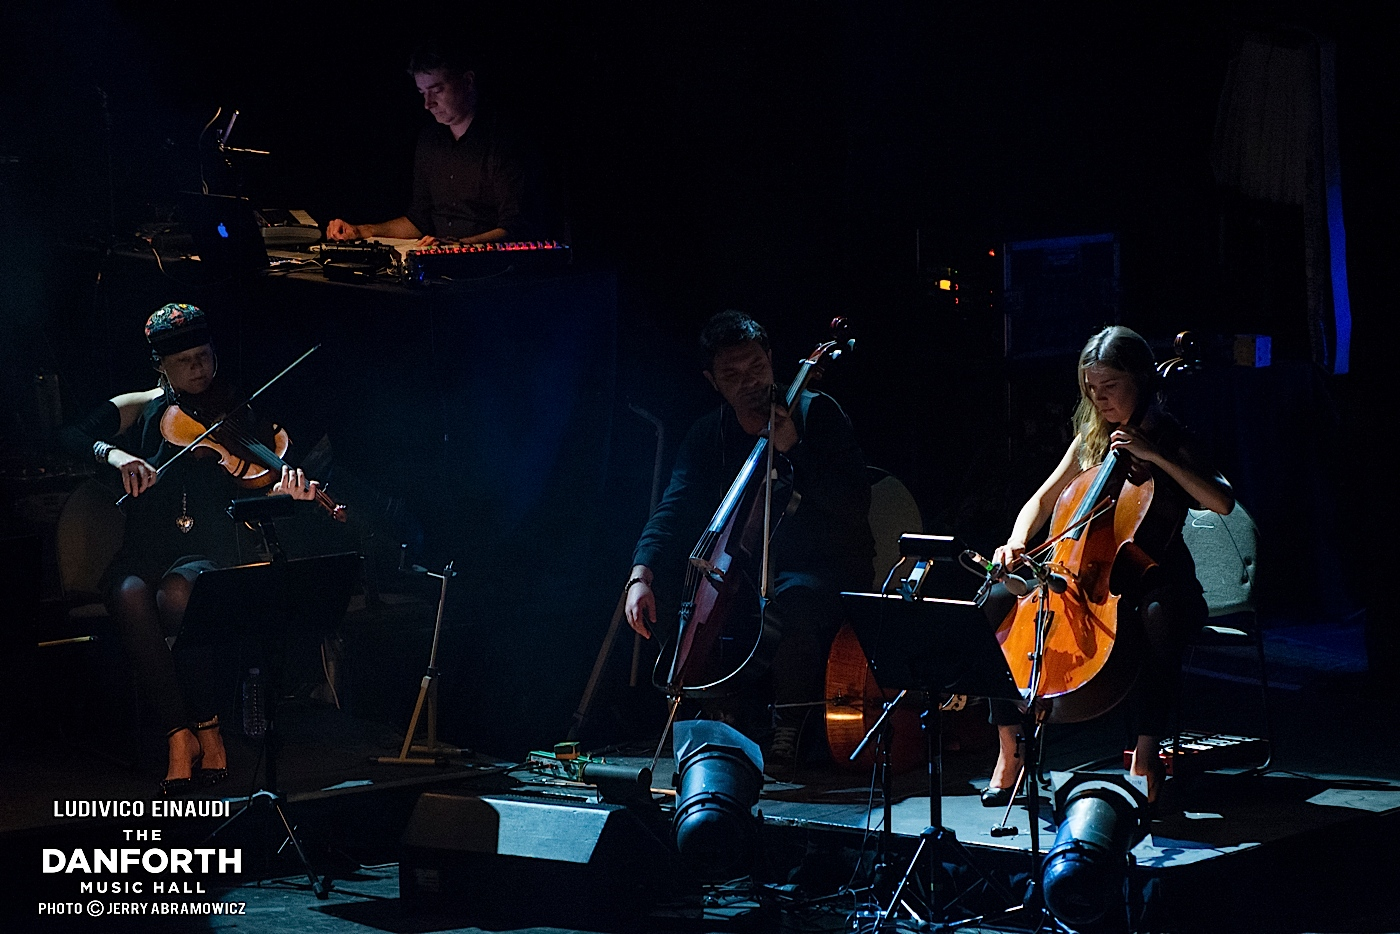 20130517 Ludivico Einaudi performs at The Danforth Music Hall Toronto 0160